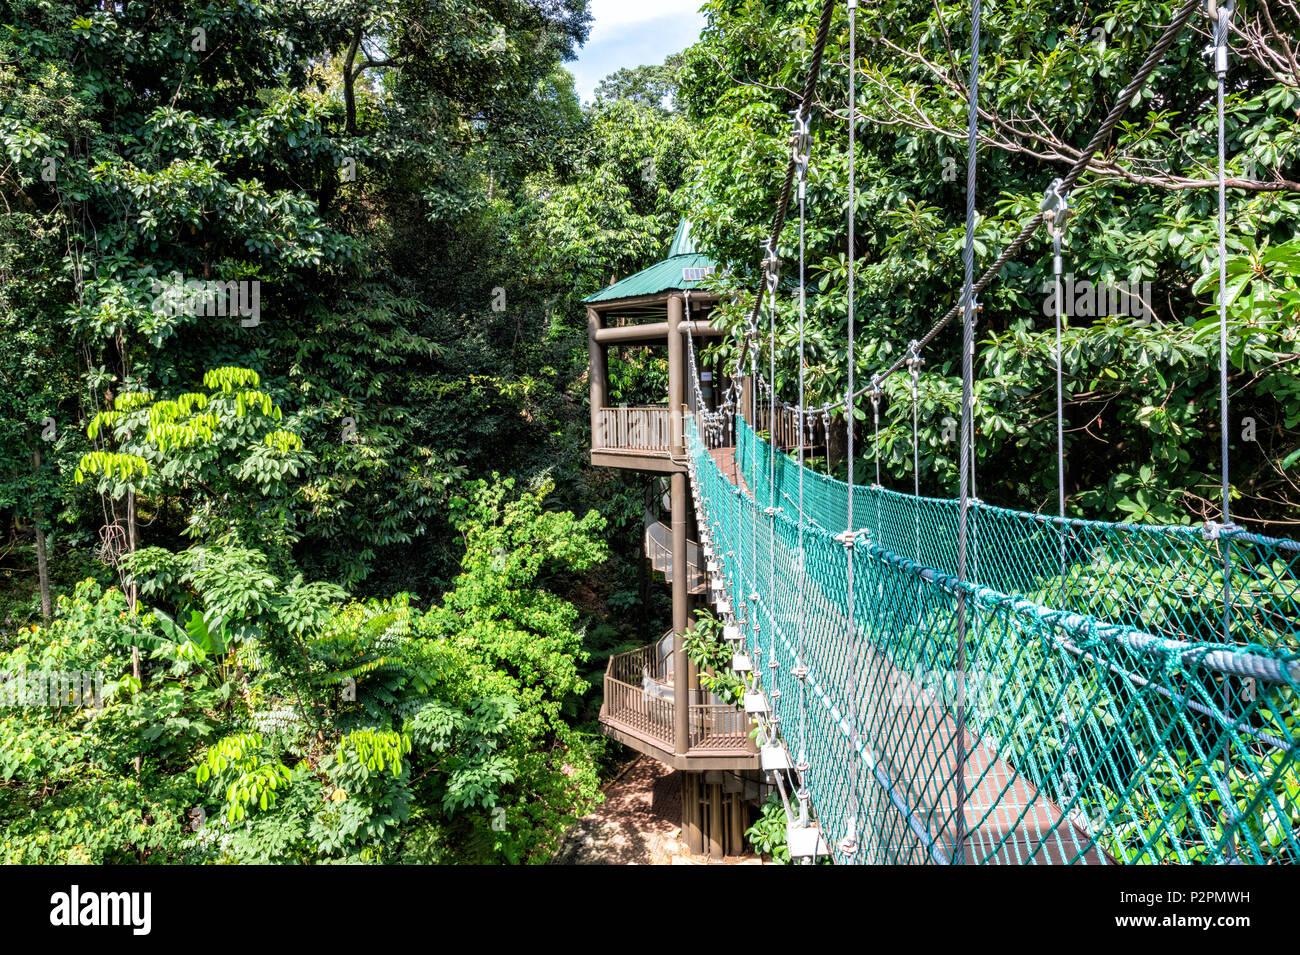 La Foret Kl Eco Park Canopy Walk A Kuala Lumpur Malaisie Banque D